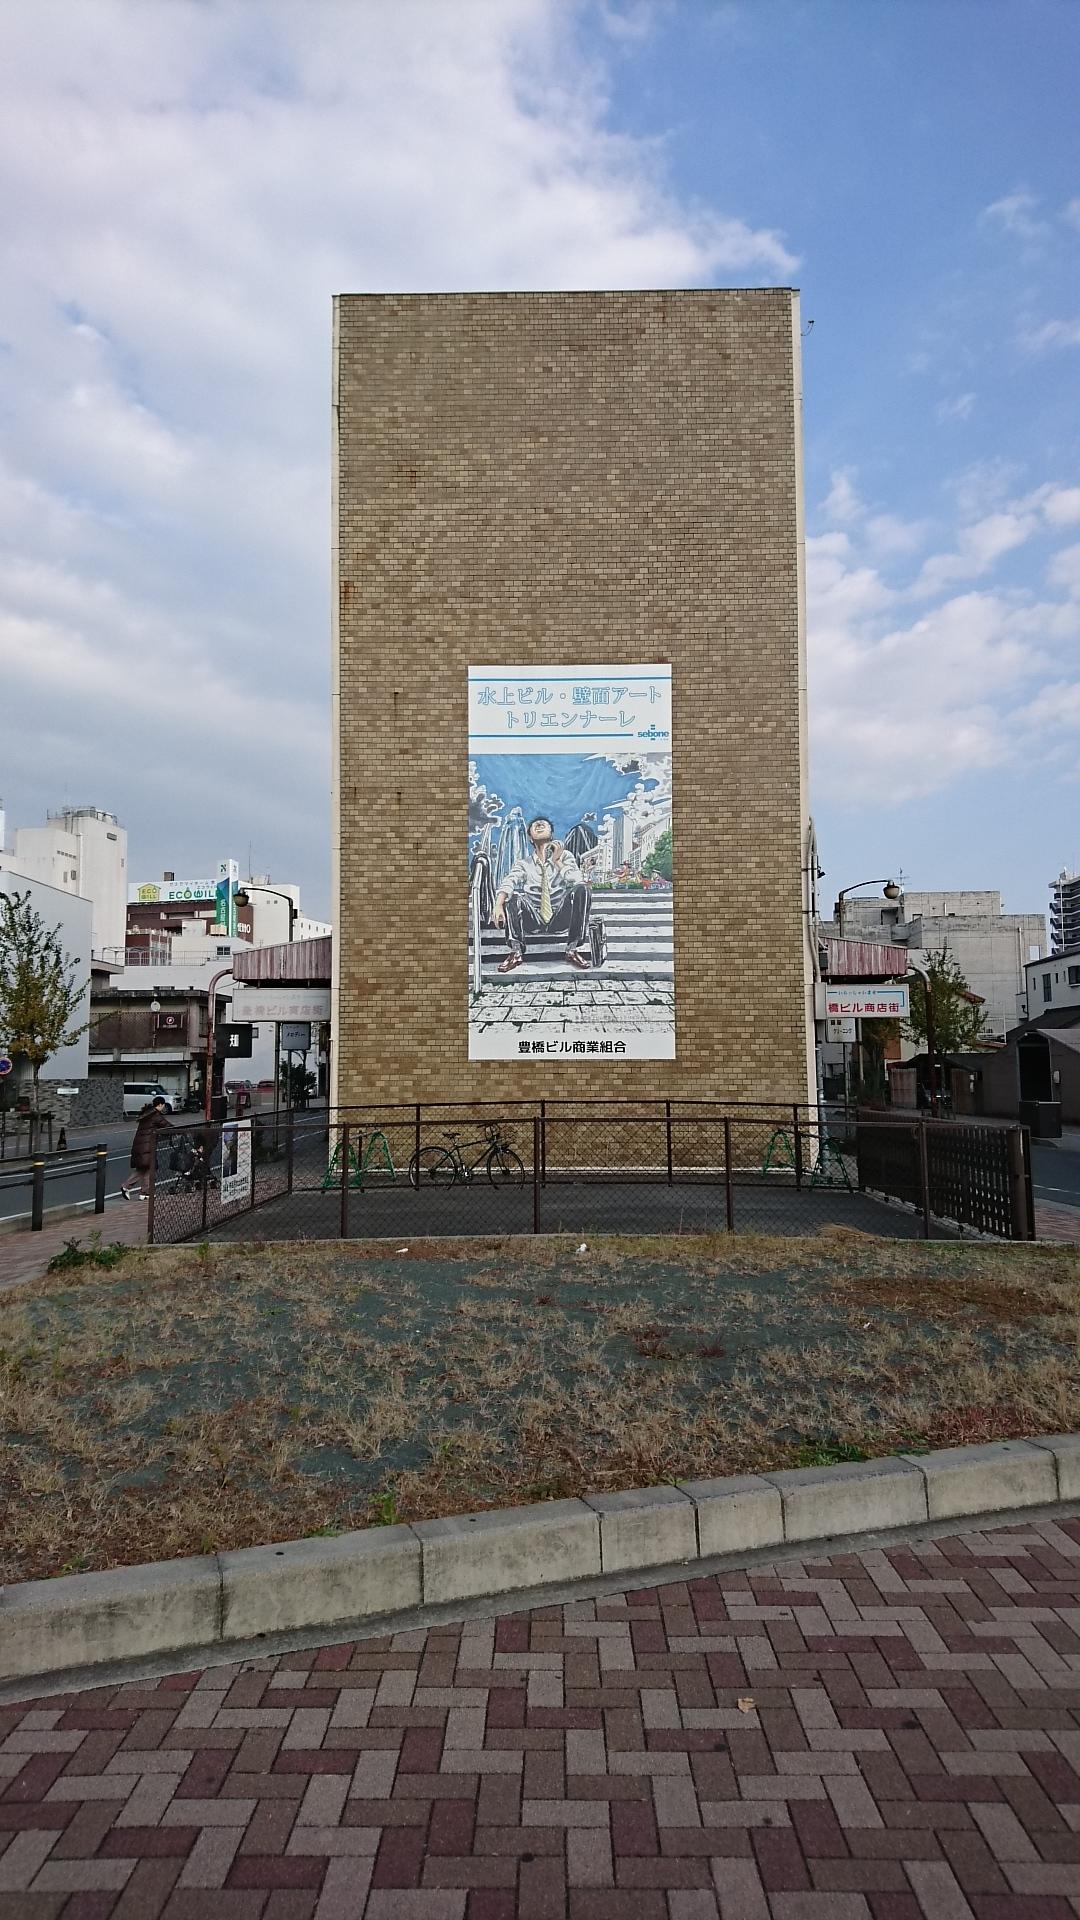 2016.12.9 豊橋 (1) 水上商店街 1080-1920